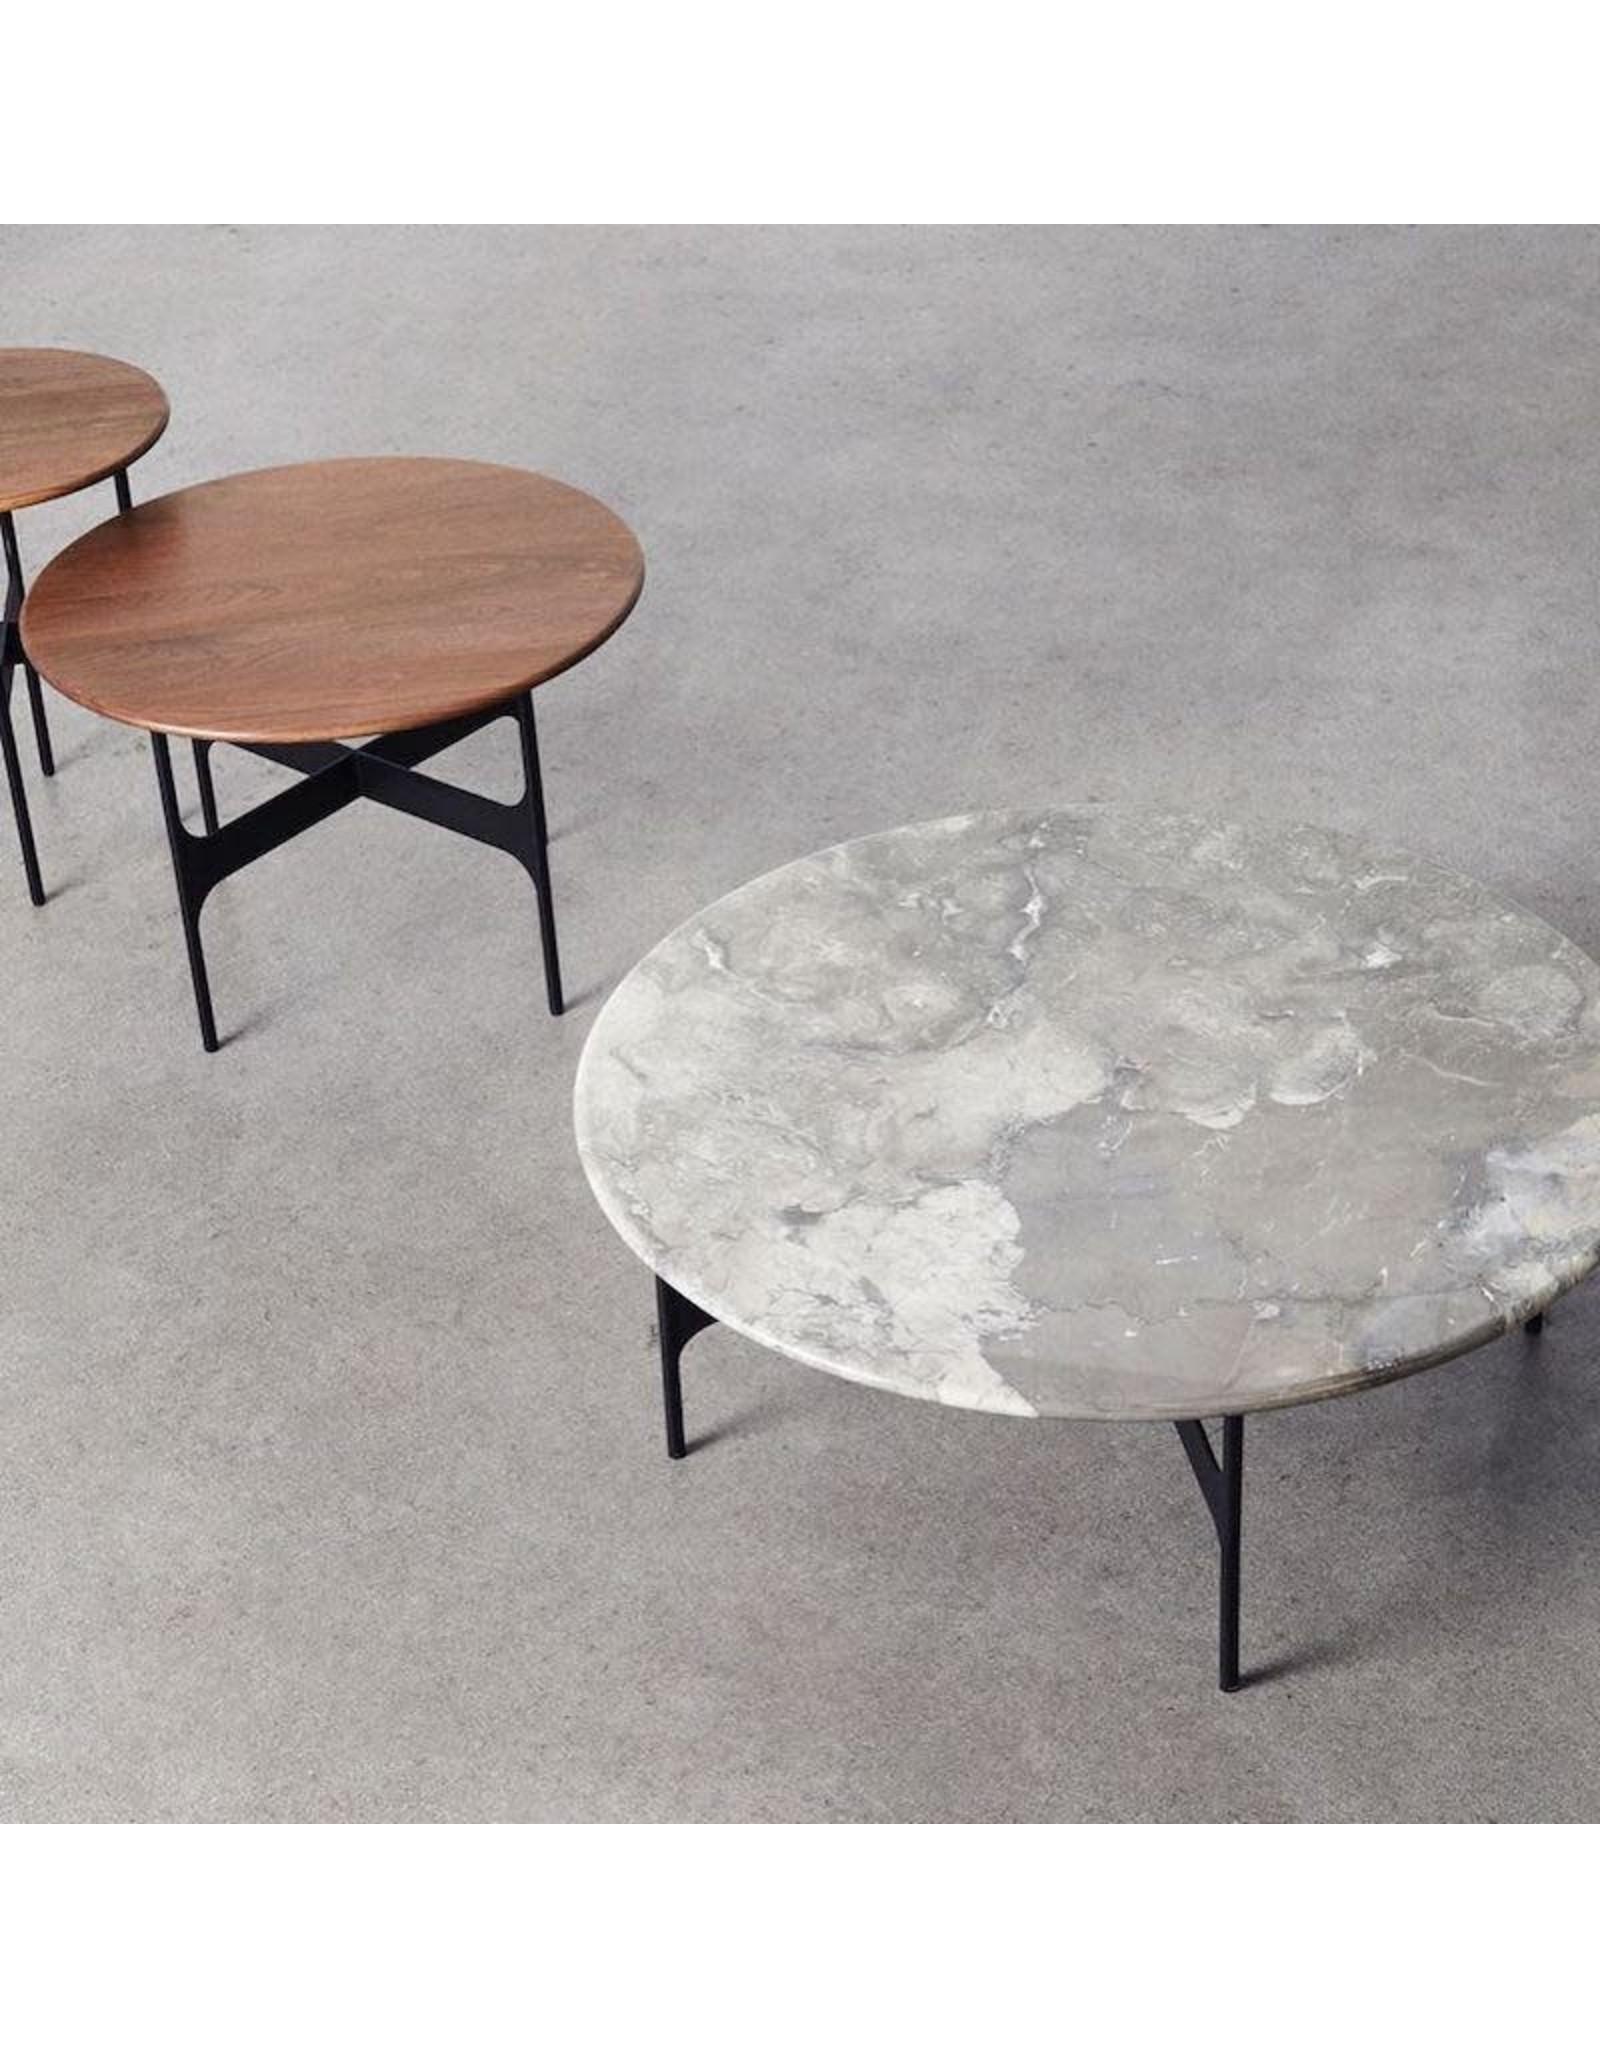 WON DESIGN FLOEMA LARGE COFFEE TABLE